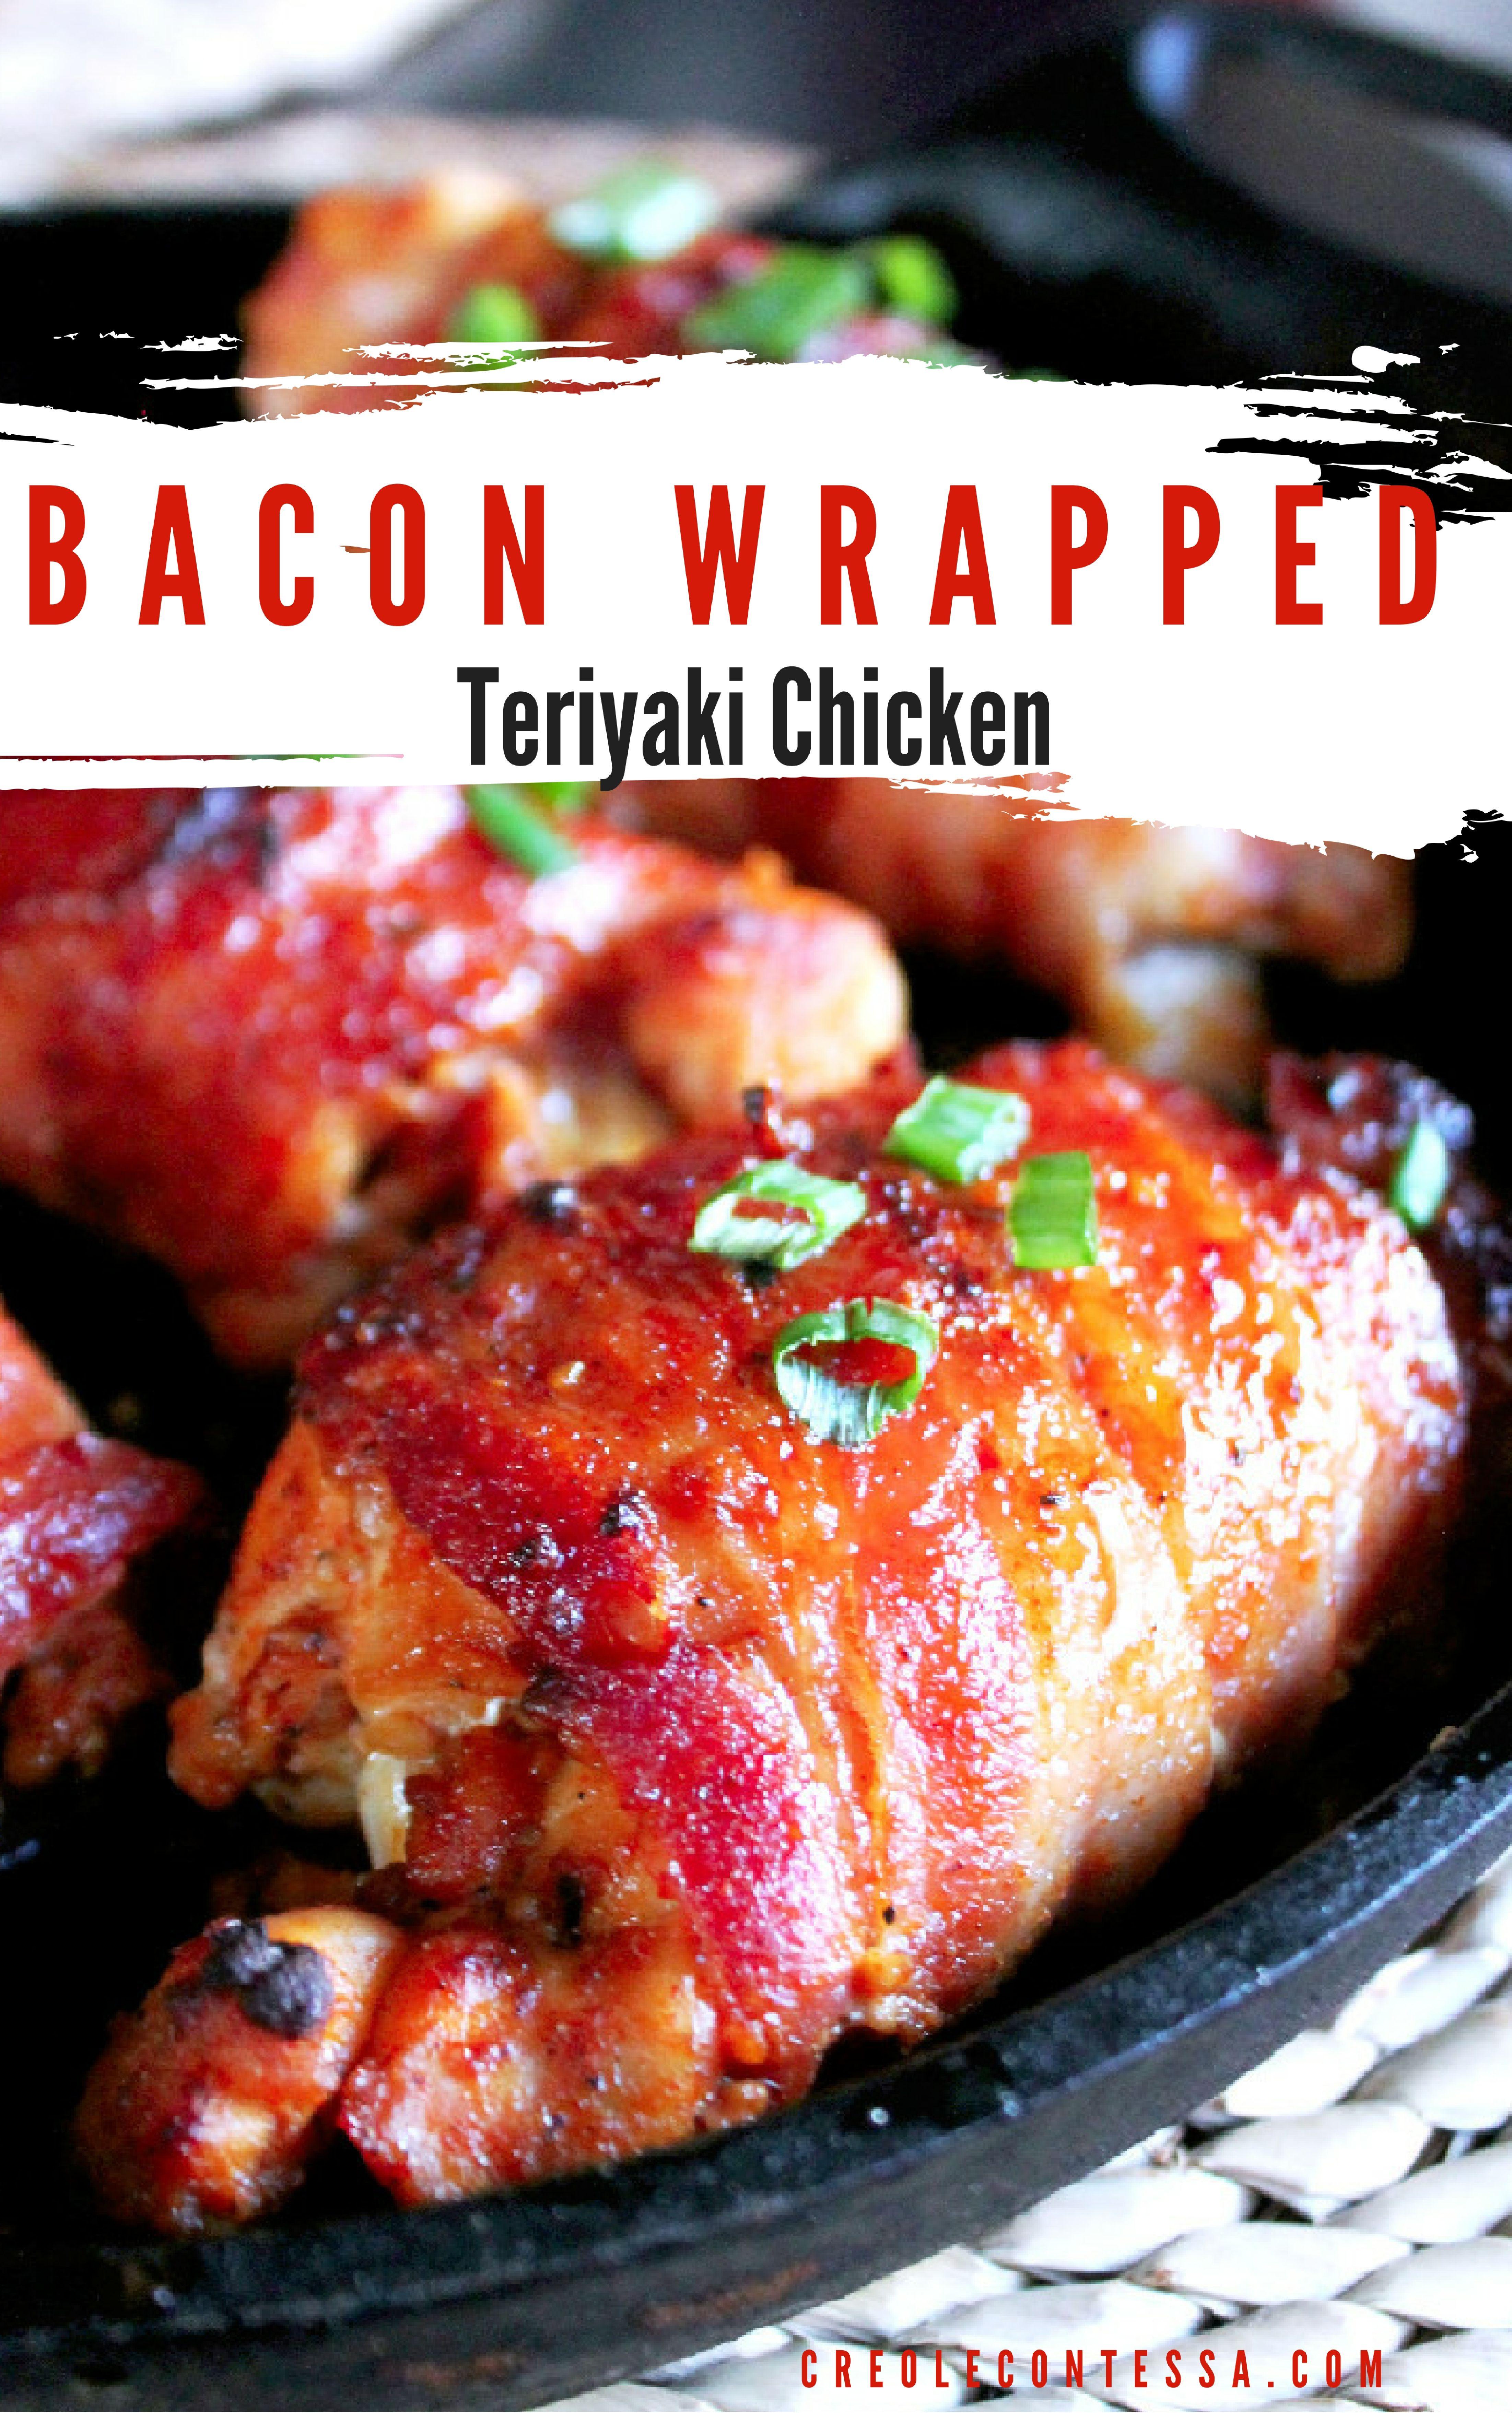 Bacon Wrapped Teriyaki Chicken With Kikkoman Creole Contessa Chicken Sauce Recipes Chicken Teriyaki Recipe Chicken Main Dishes